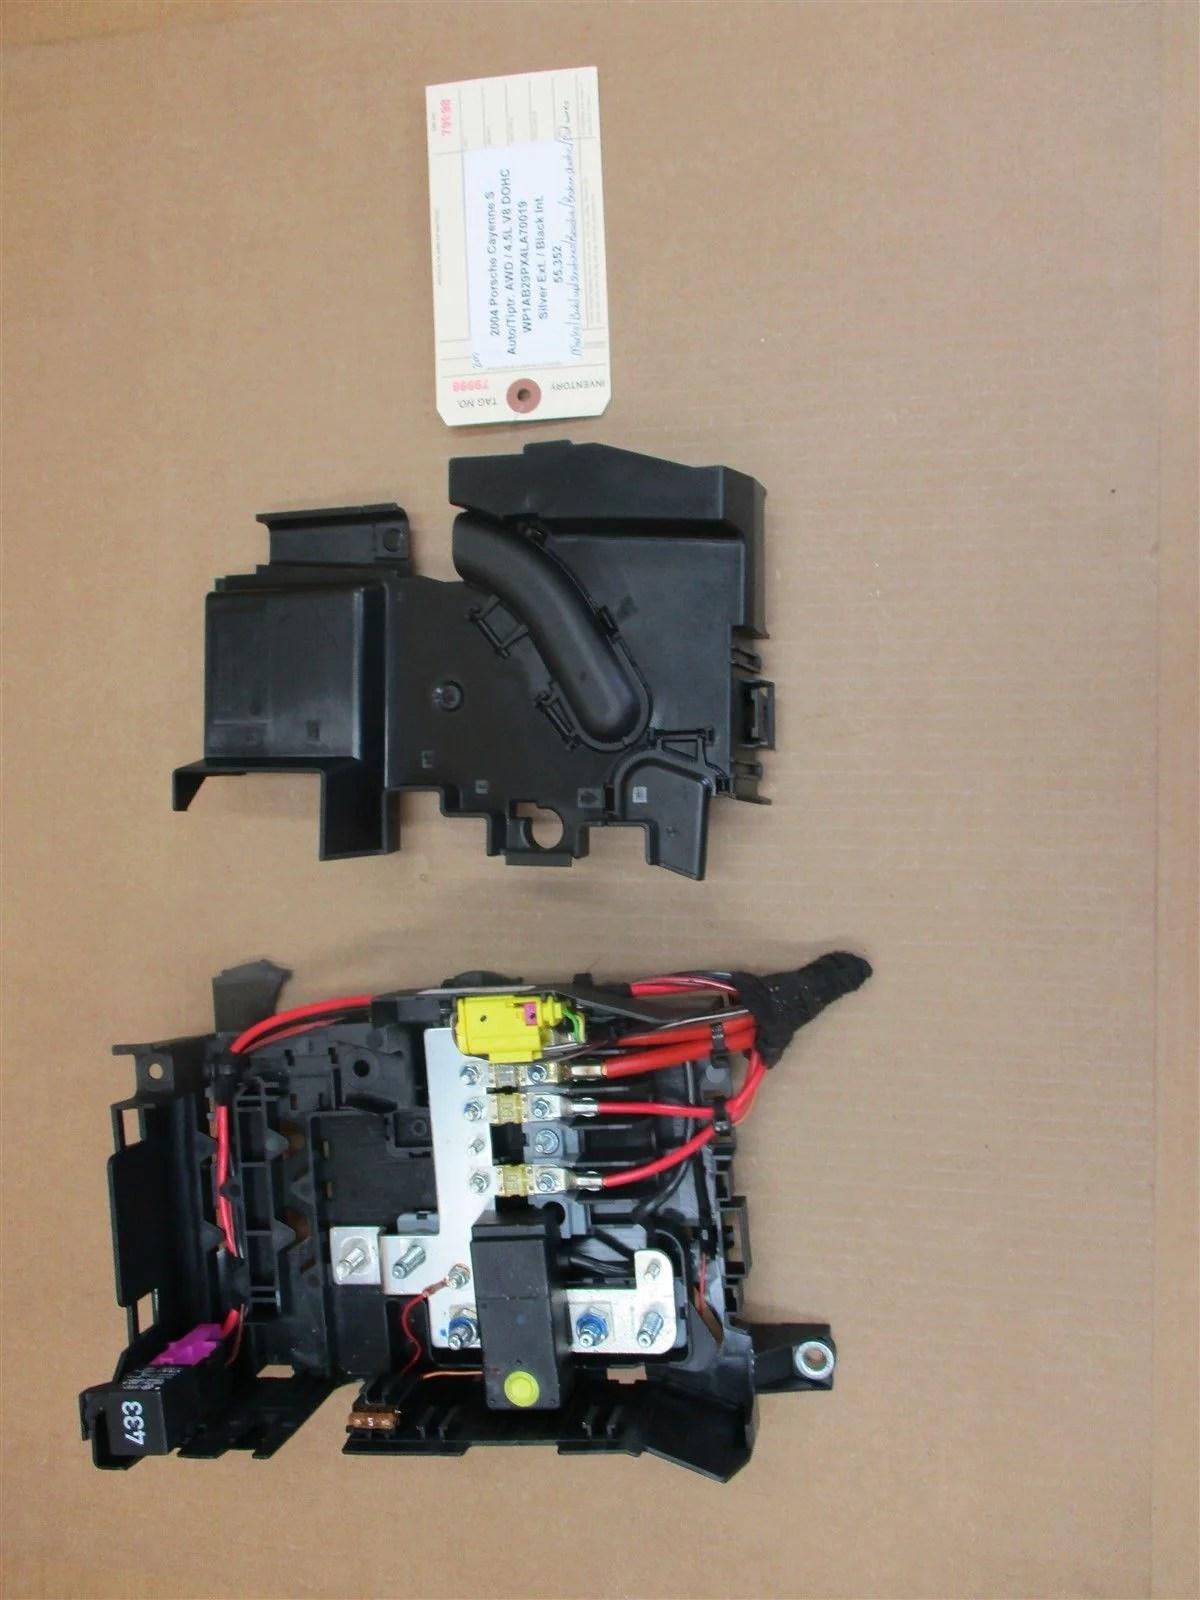 hight resolution of 04 cayenne s porsche 955 fuse box relay 7l0937548 3d0951253a 7l0937555 55 352